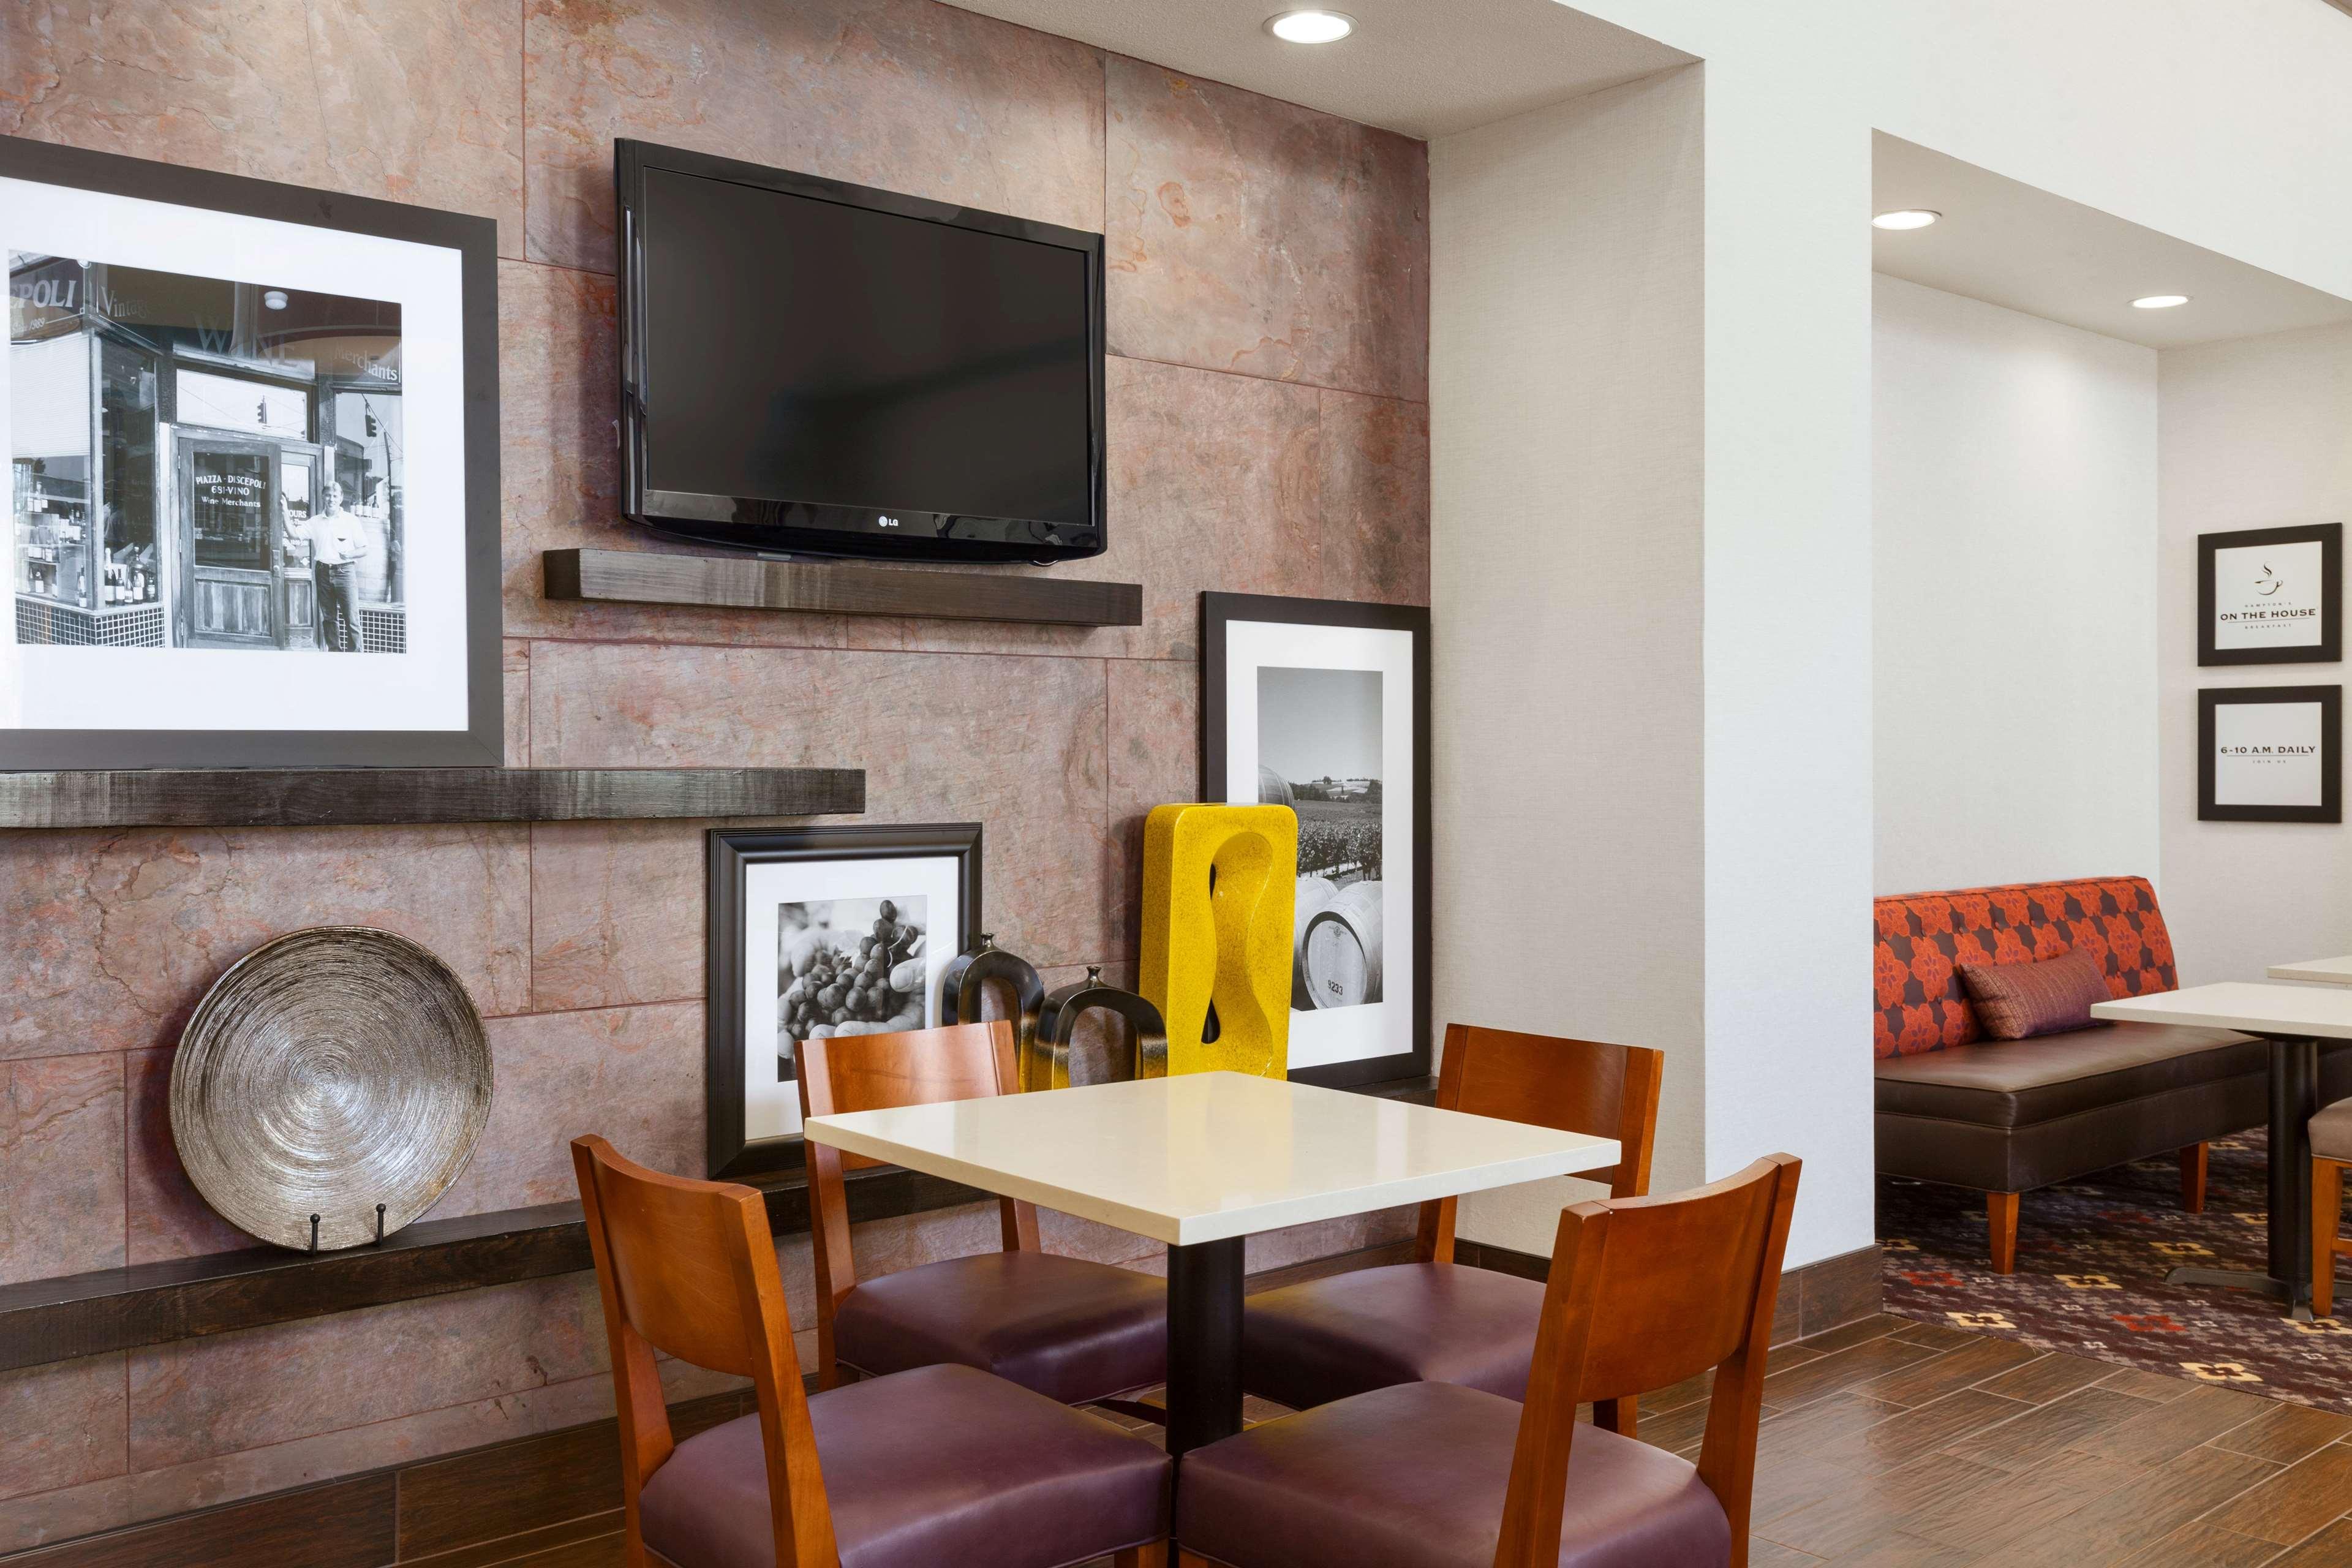 Hampton Inn & Suites Rohnert Park - Sonoma County image 5